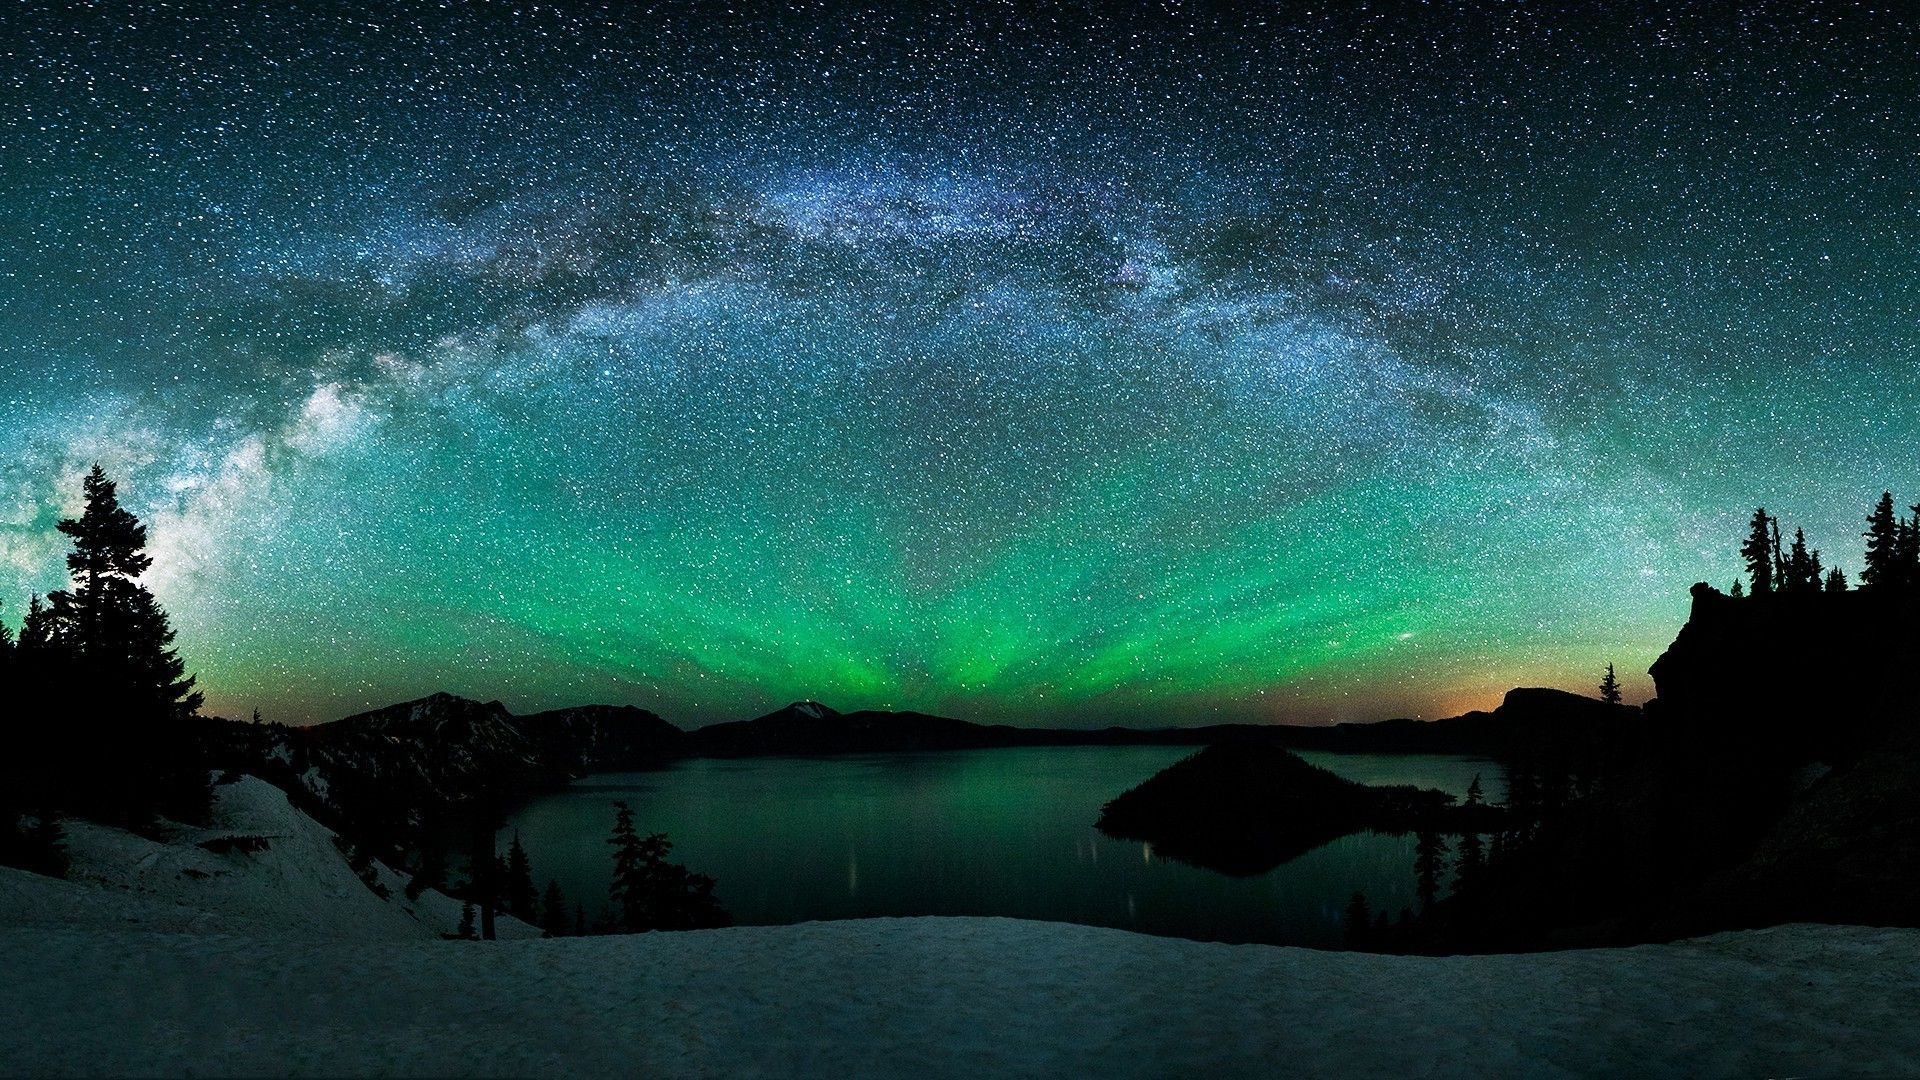 Aurora Borealis Northern Lights 1920 X 1080